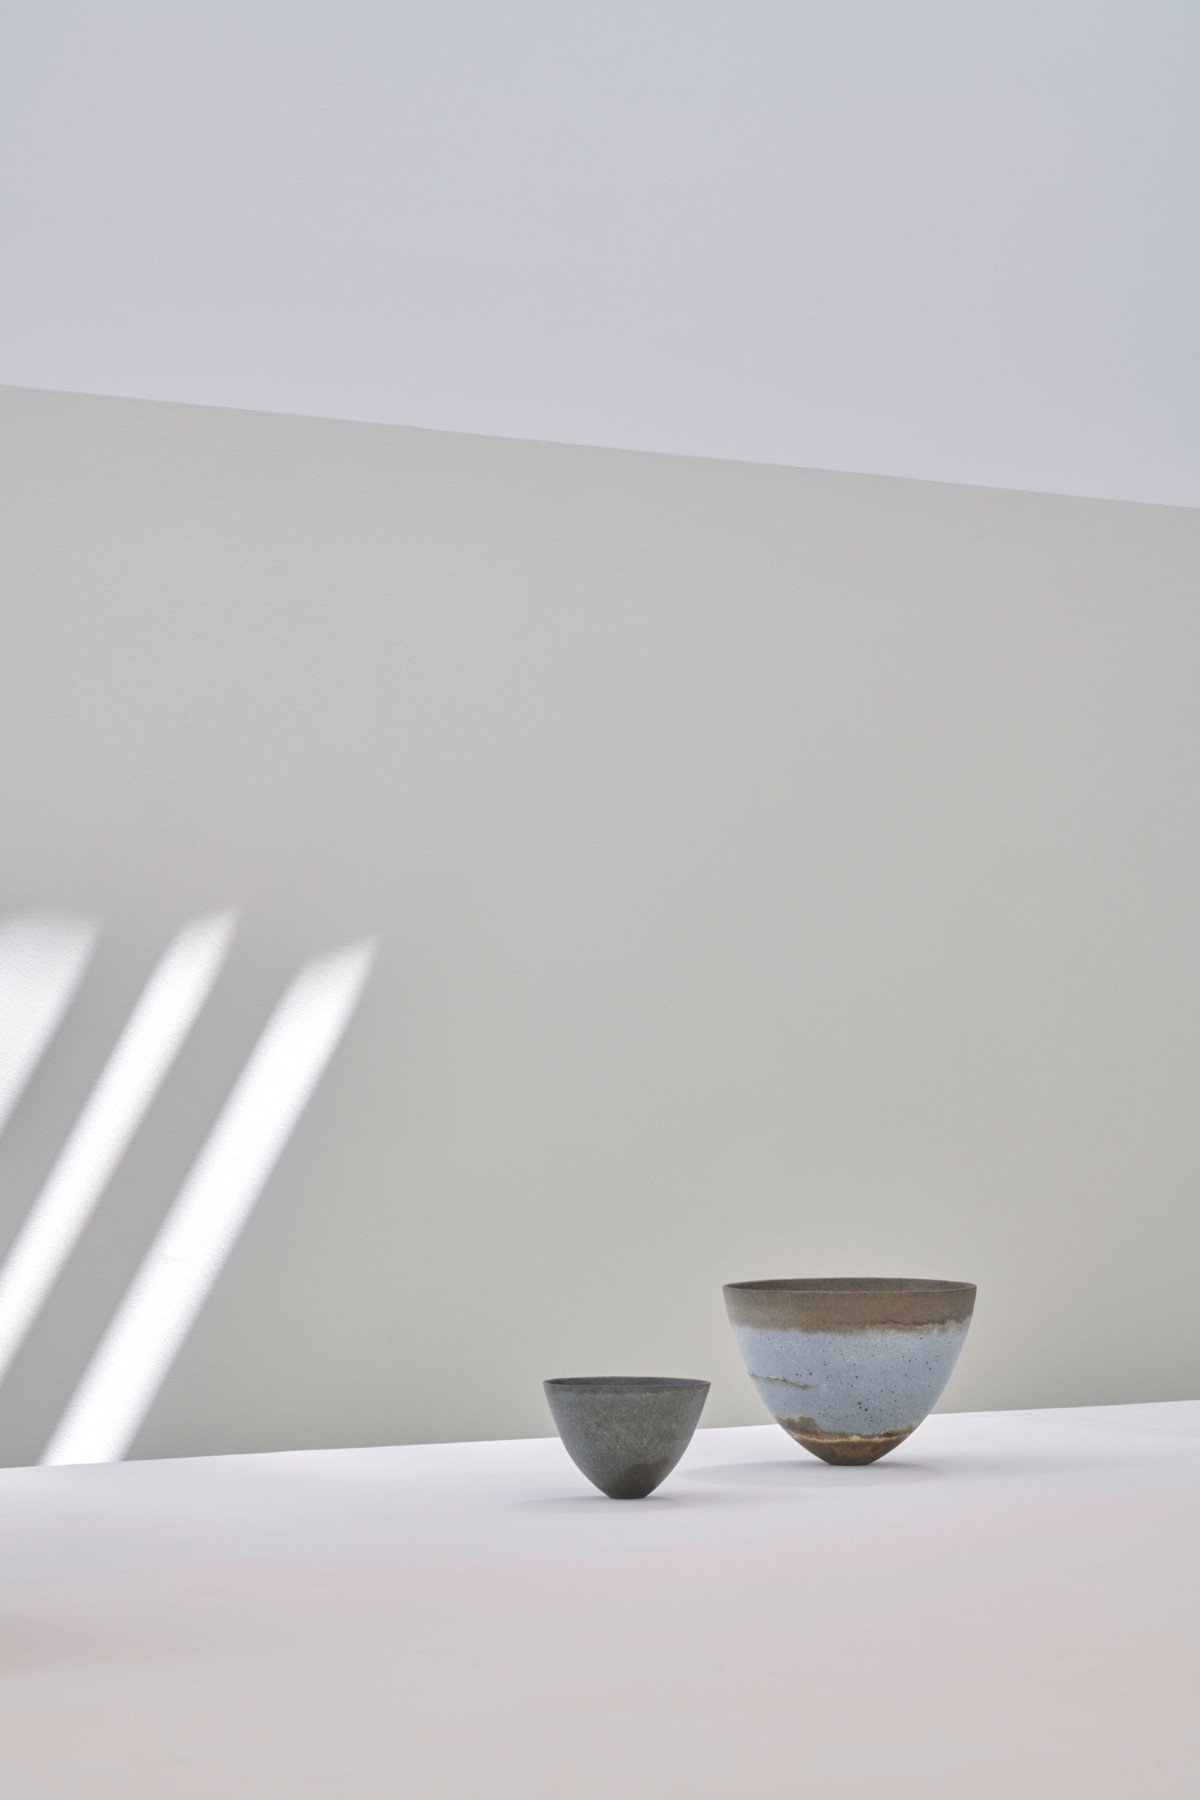 Jamie-fobert-architects-exhibition-design-gallery-Jennifer-Lee Kettles-Yard Jo-Underhill-870